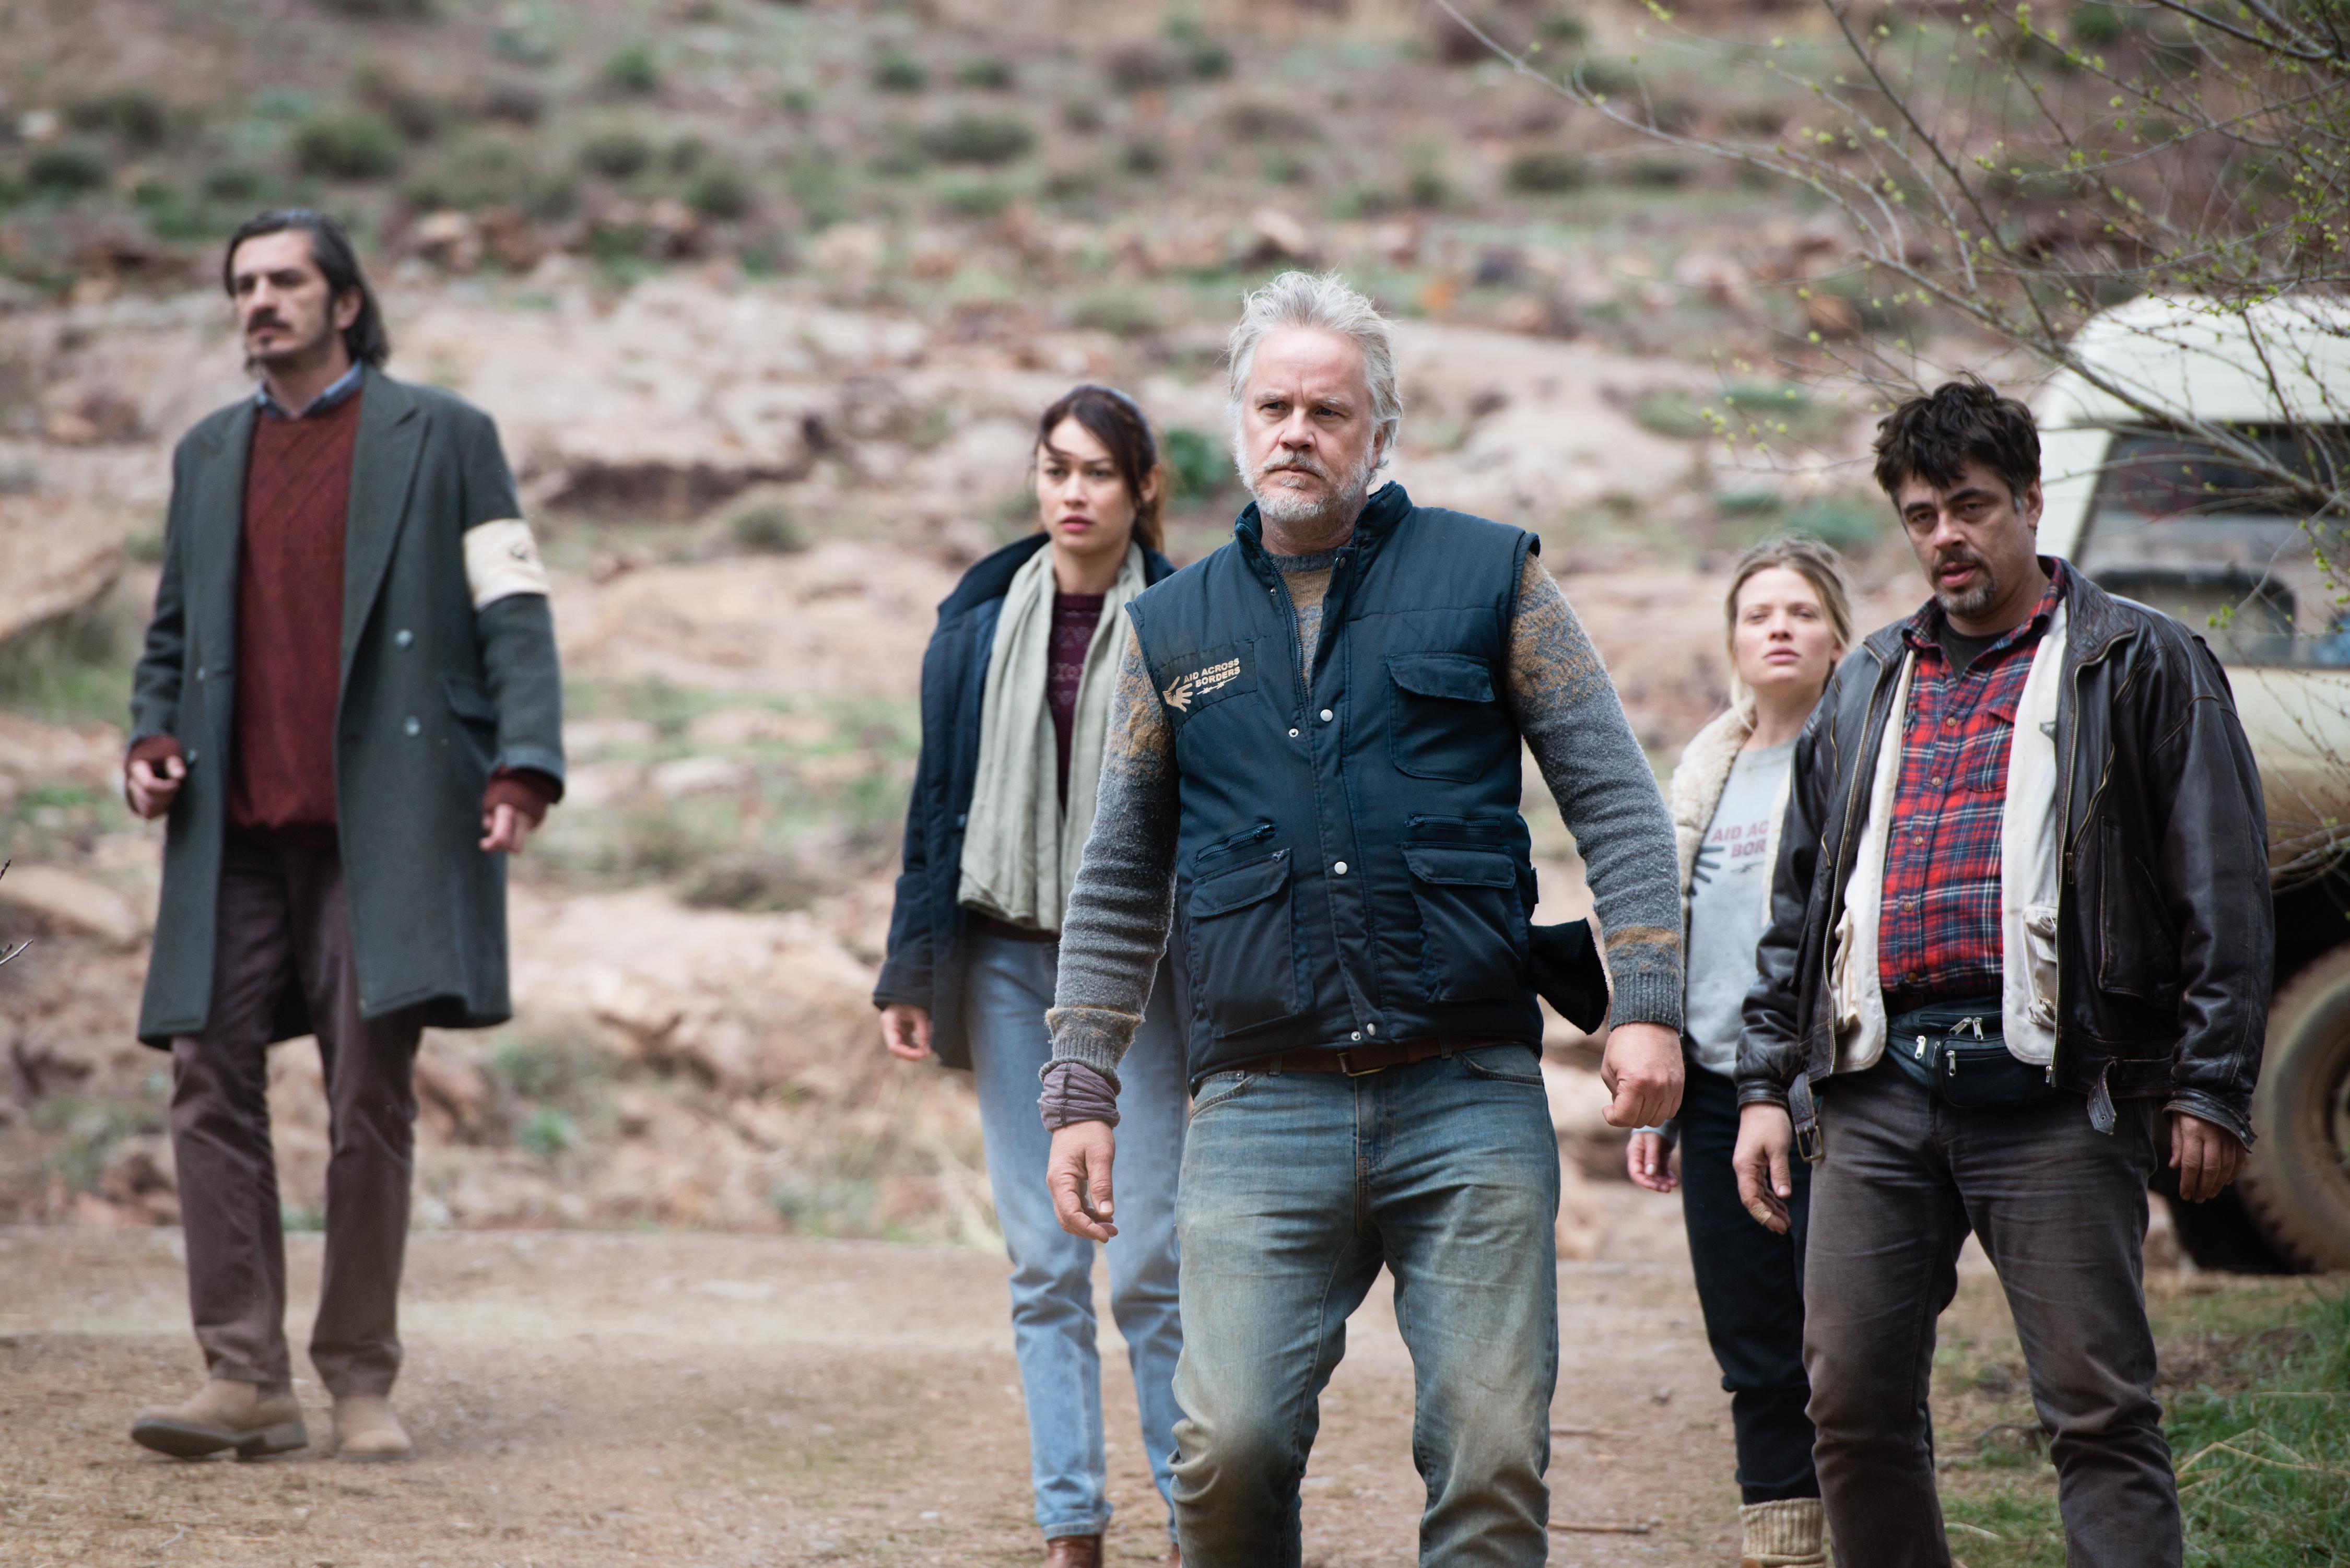 A Perfect Day: Tim Robbins, Benicio Del Toro, Olga Kurylenko, Mélanie Thierry e Fedja Stukan in una scena